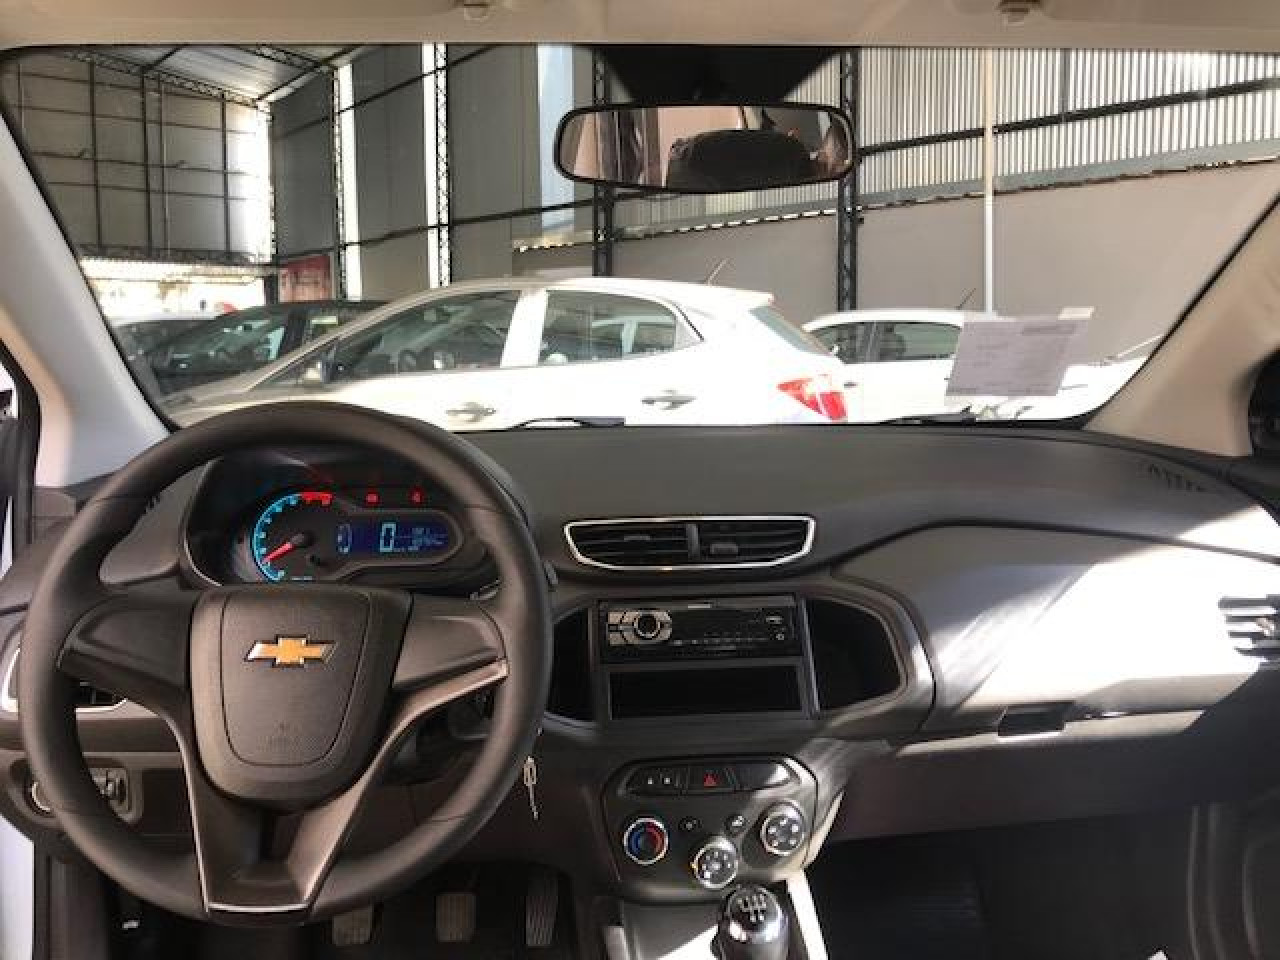 Onix Hatch 1.0 4P FLEX LT